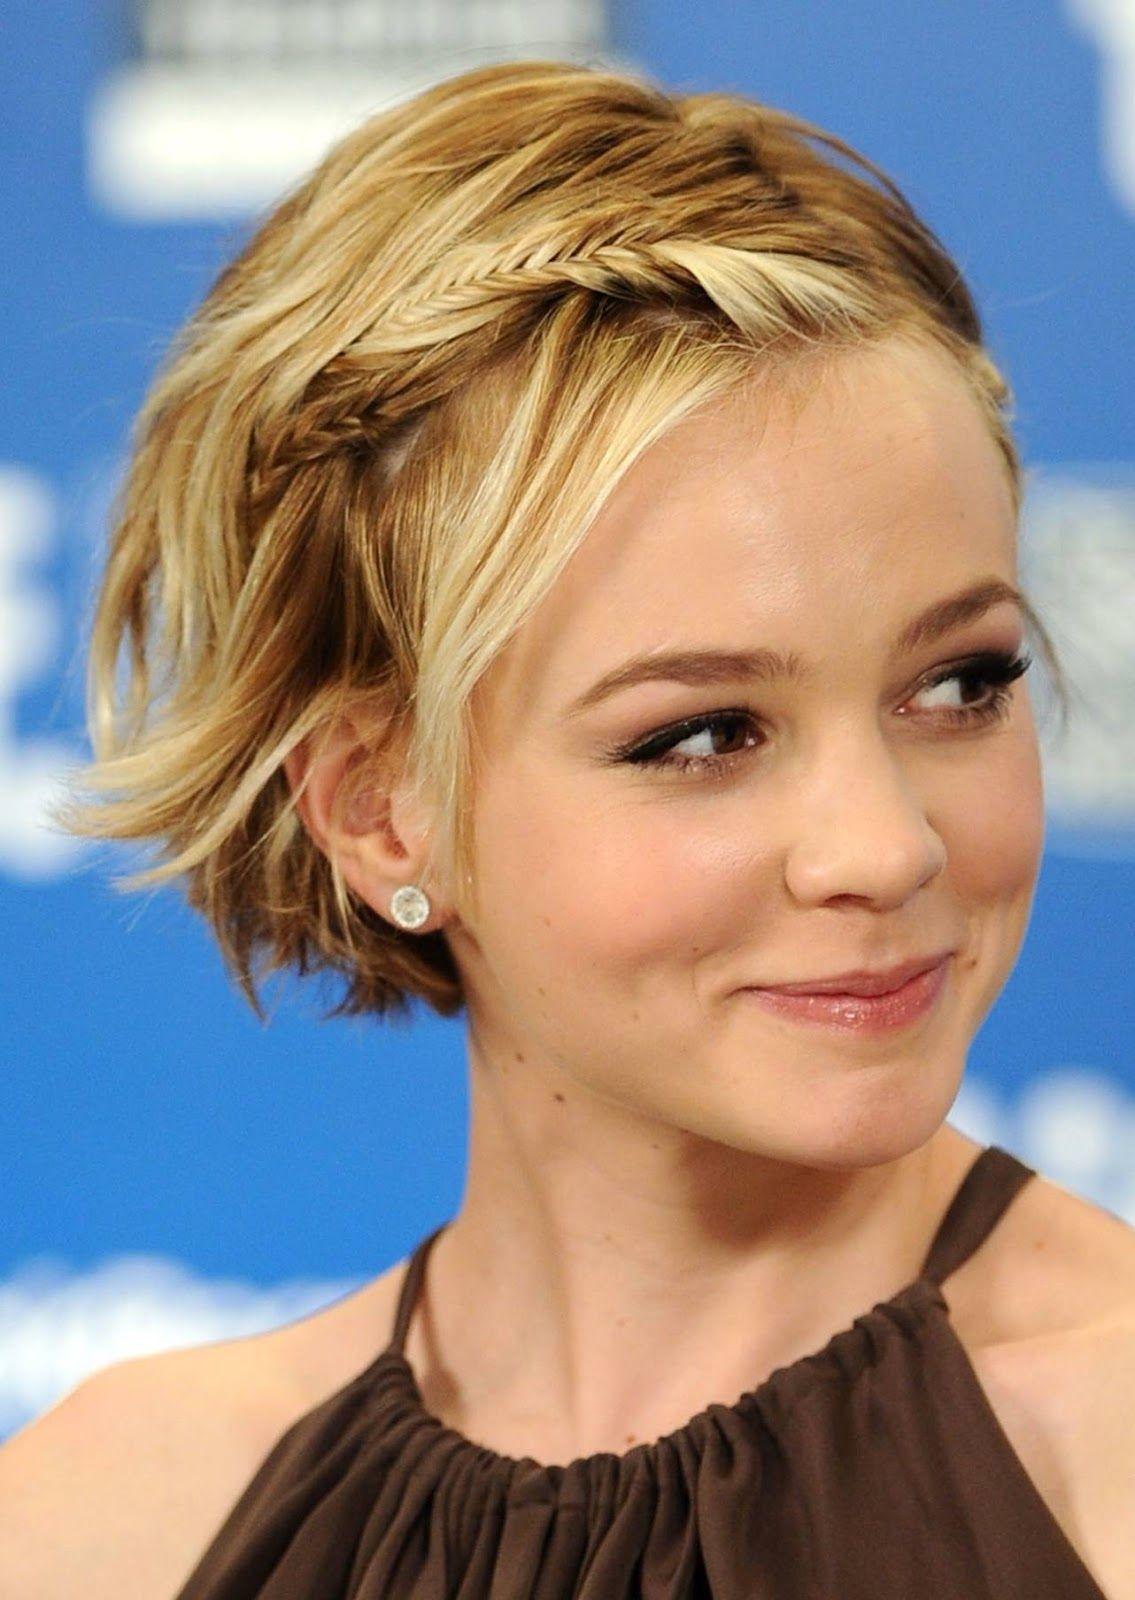 Cute Hairstyles for Short Hair short hair fixes Pinterest